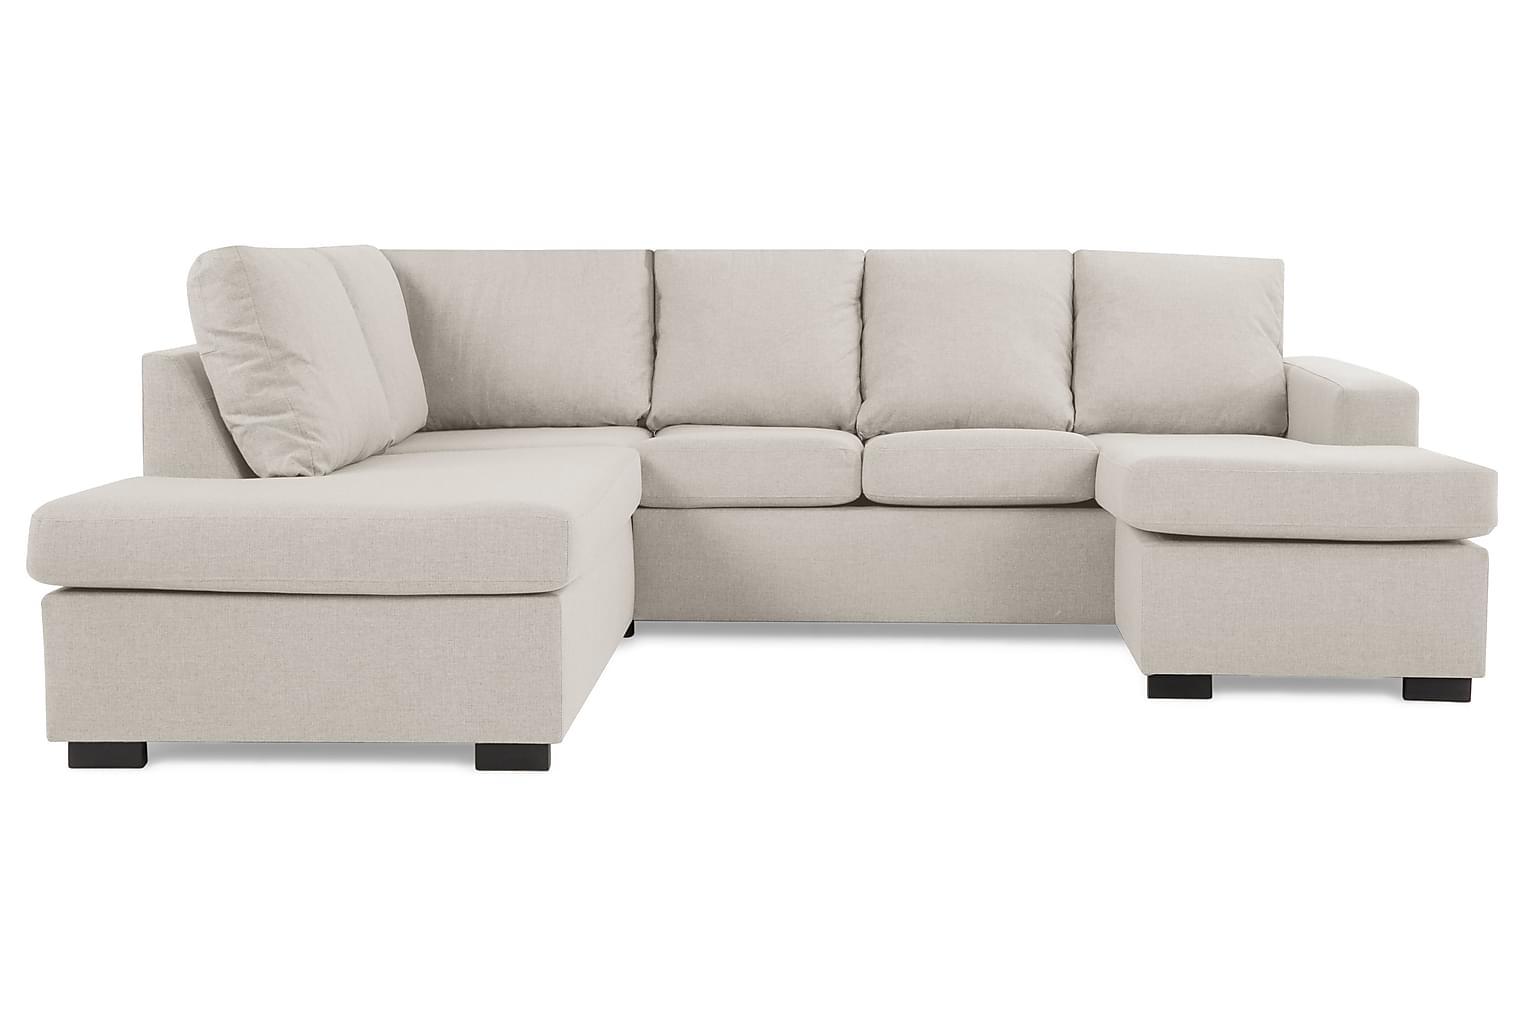 New NEW YORK U-soffa Vänster Beige -